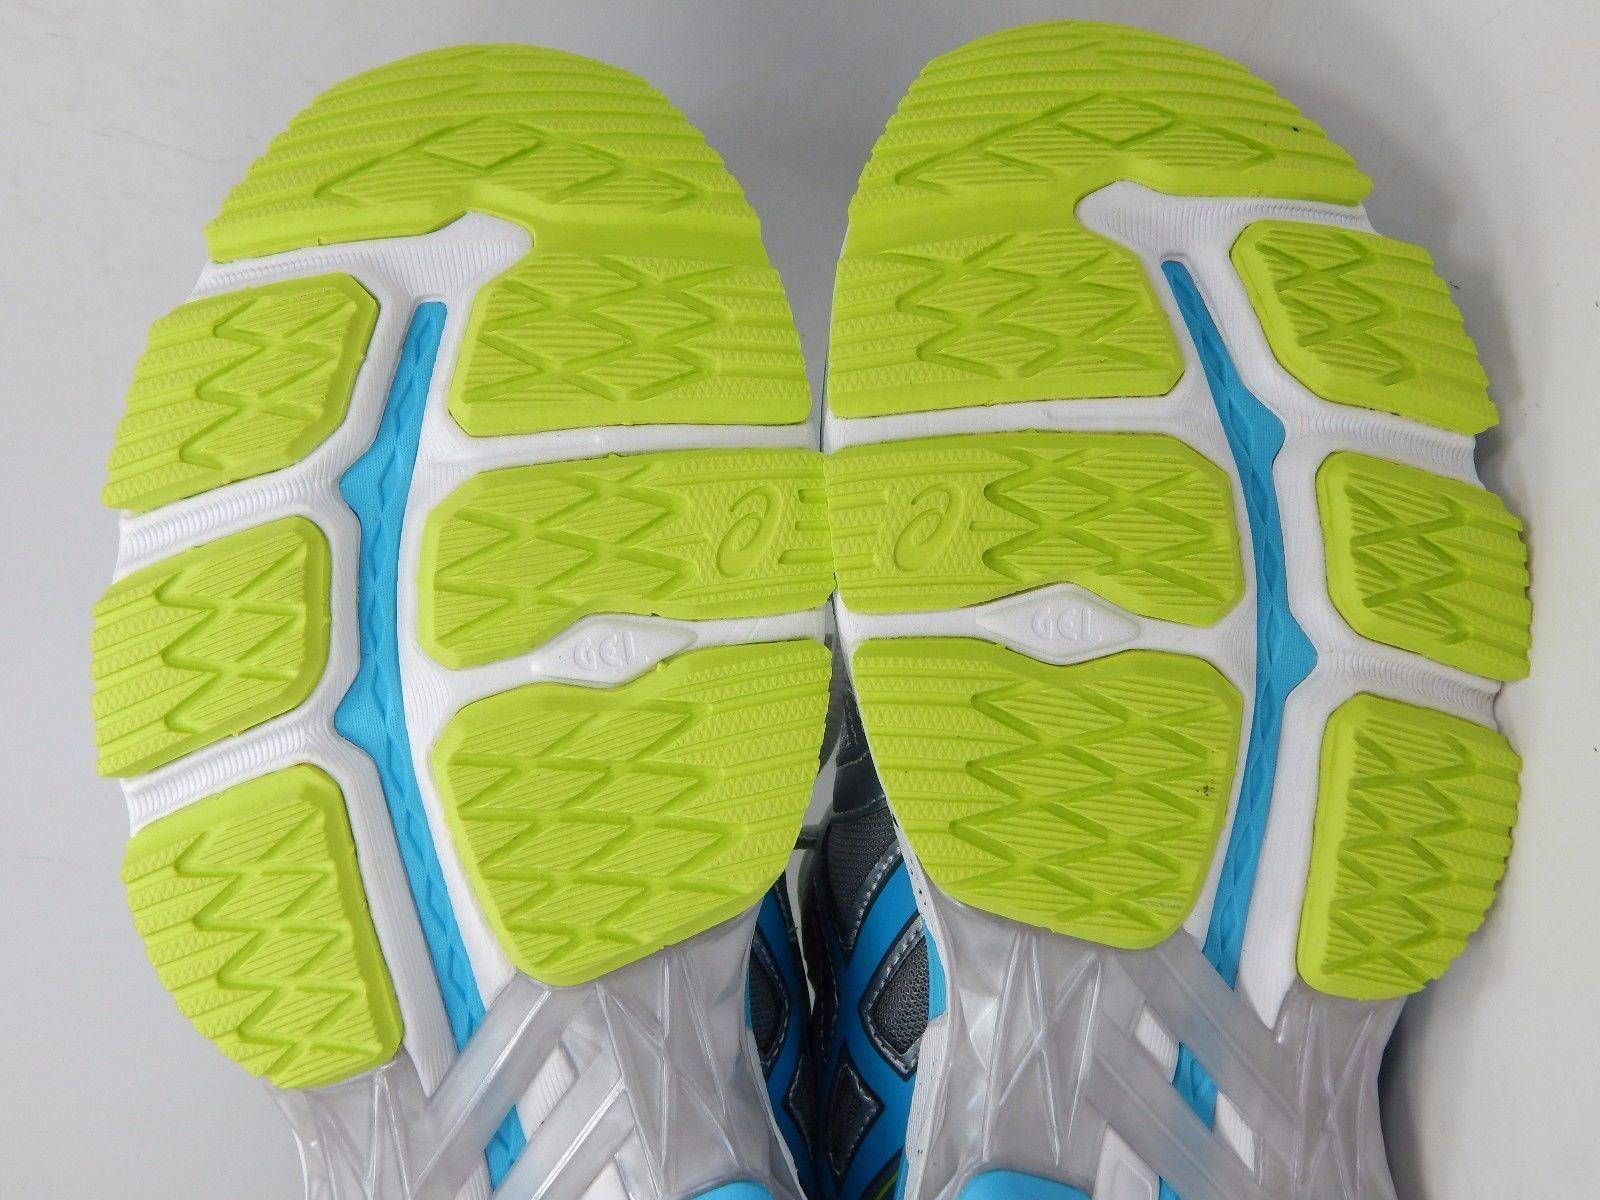 Asics GT 2000 v 4 Women's Running Shoes Sz US 7.5 2A NARROW EU 39 Silver T659N